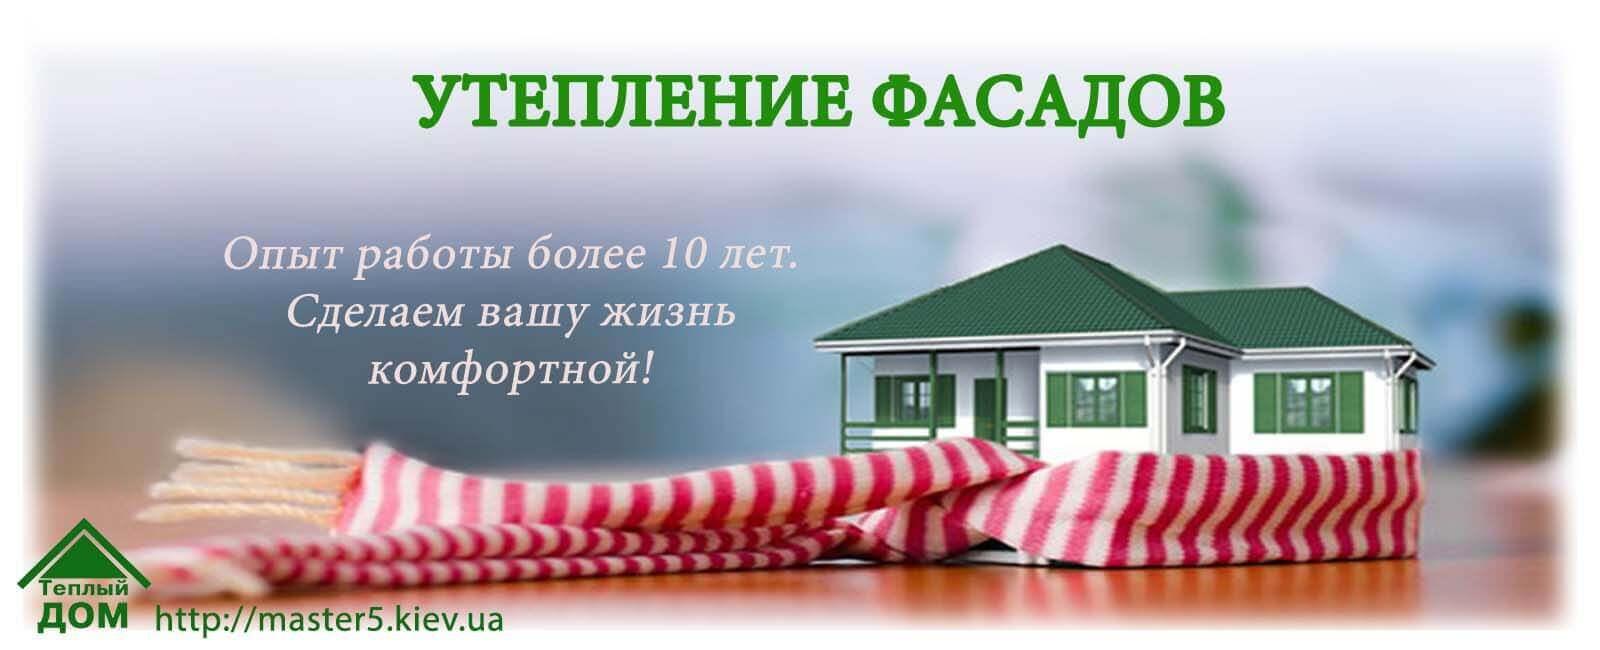 banner-utepleniye-fasadov